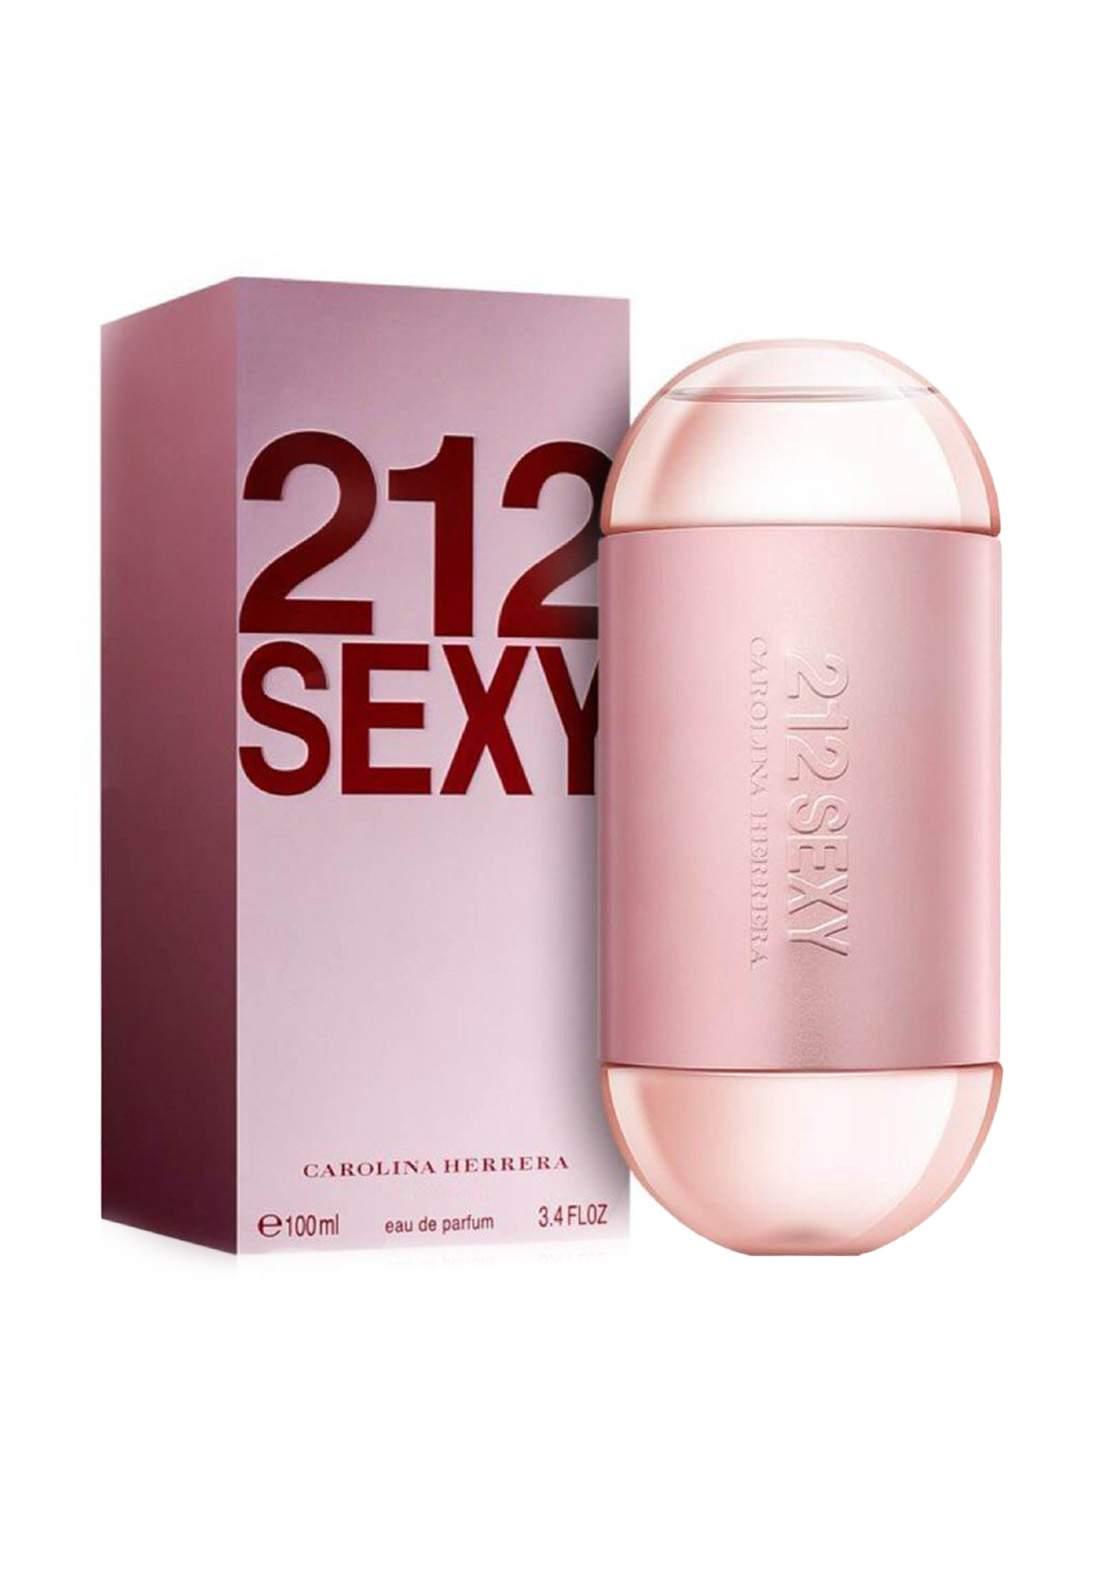 Carolina Herrera 212 Sexy for Women Eau de Parfum 3.4oz عطر نسائي